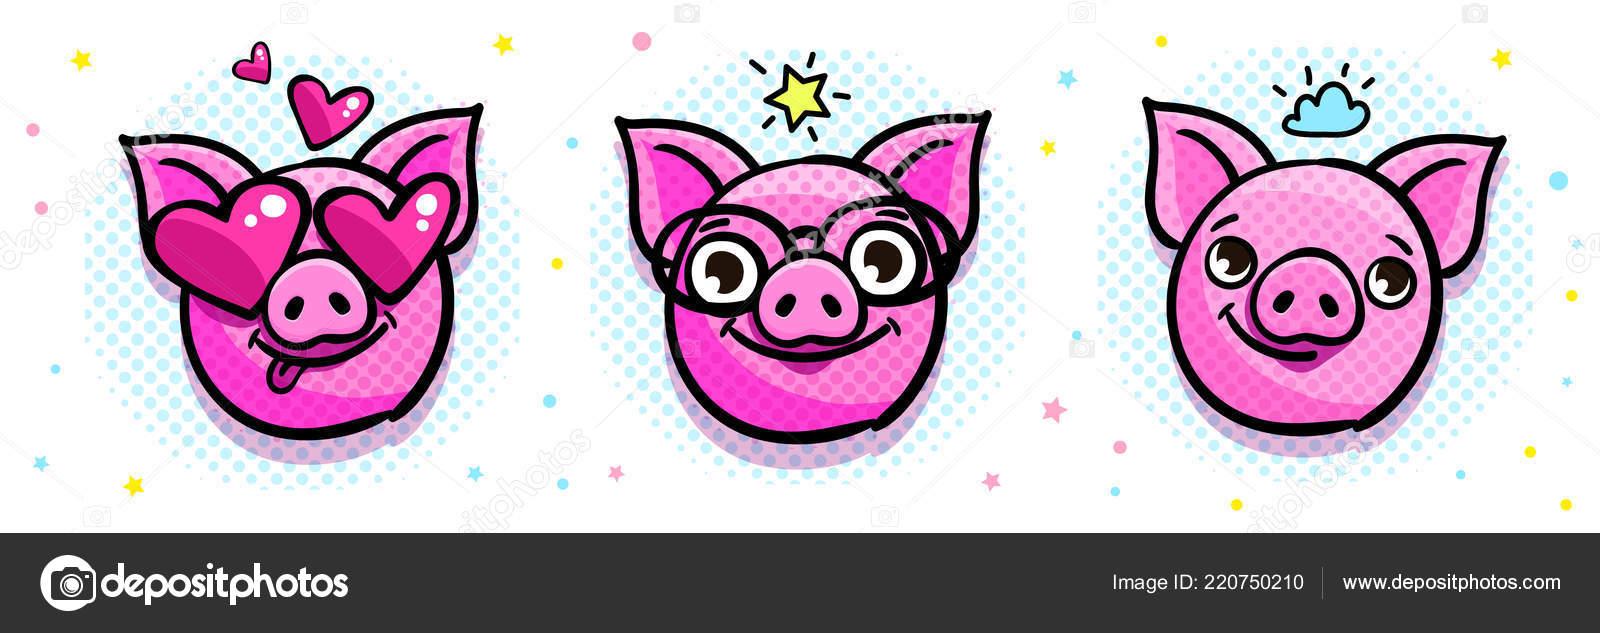 pig symbol 2019 new year head emoji pig pop art stock vector